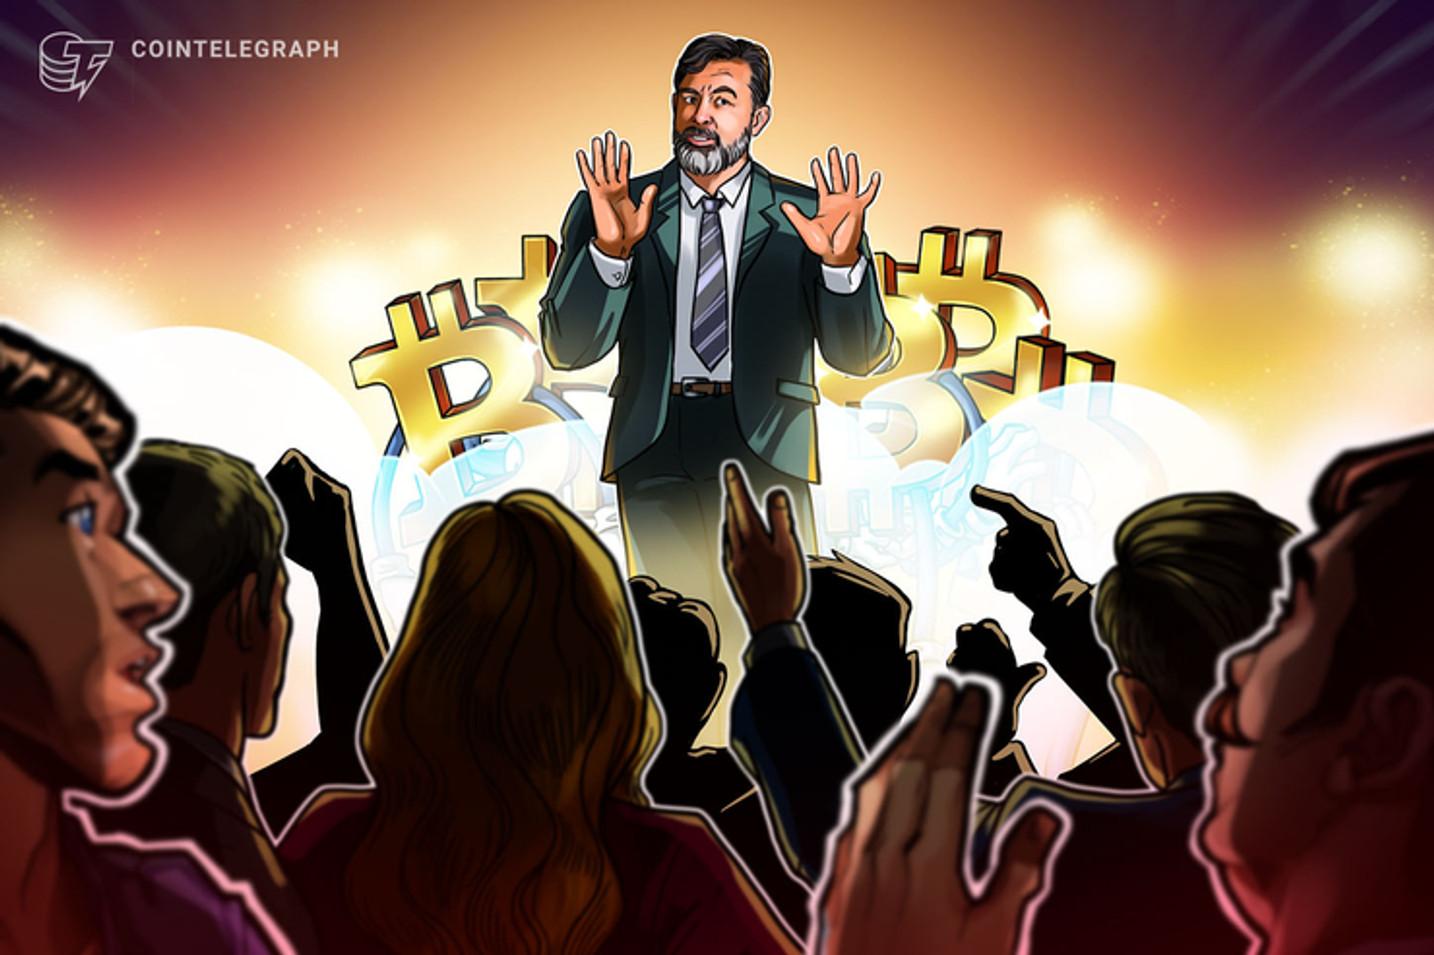 Com prejuízo de R$ 170 mil e ativos 'sequestrados', empresário protesta na sede do Bitcoin Banco